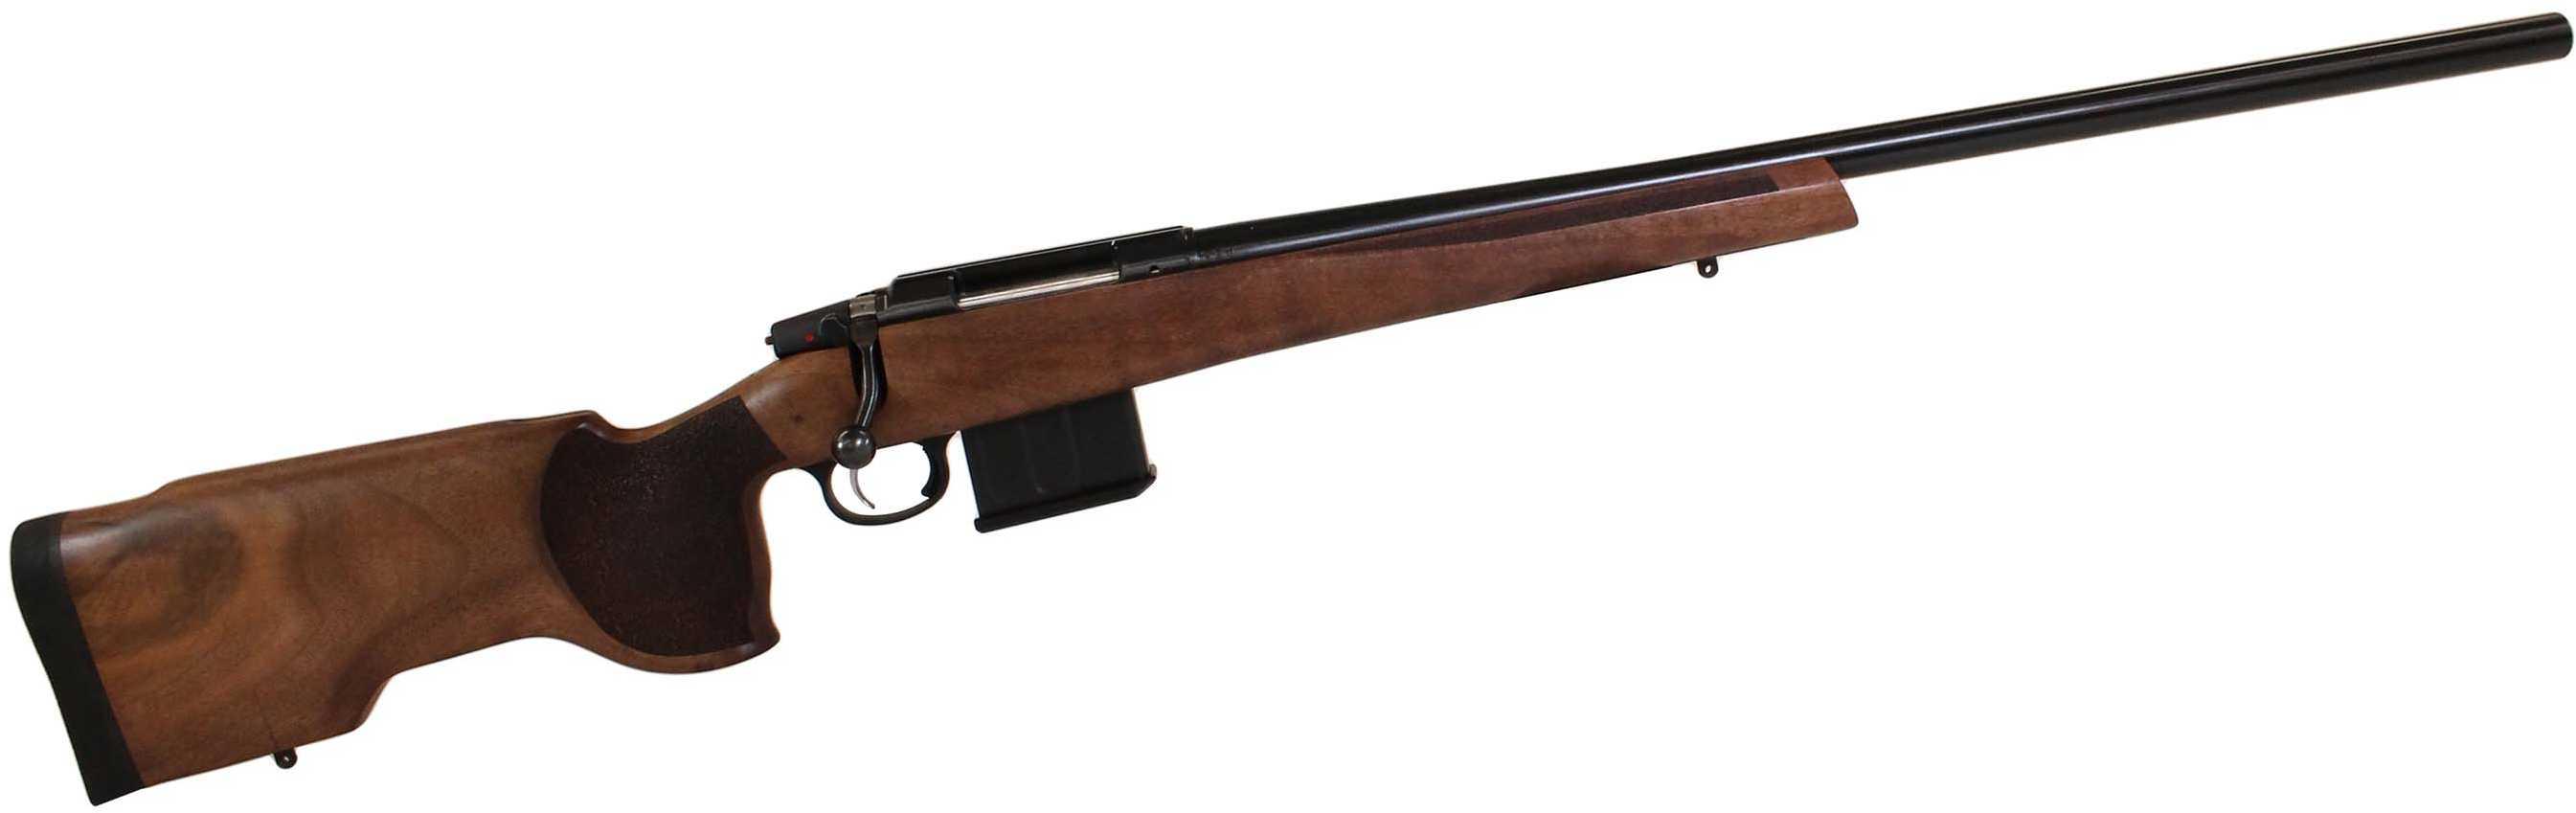 "Rifle Cz Usa 557 Varmint 308 Win 25.6"" Barrel04815"